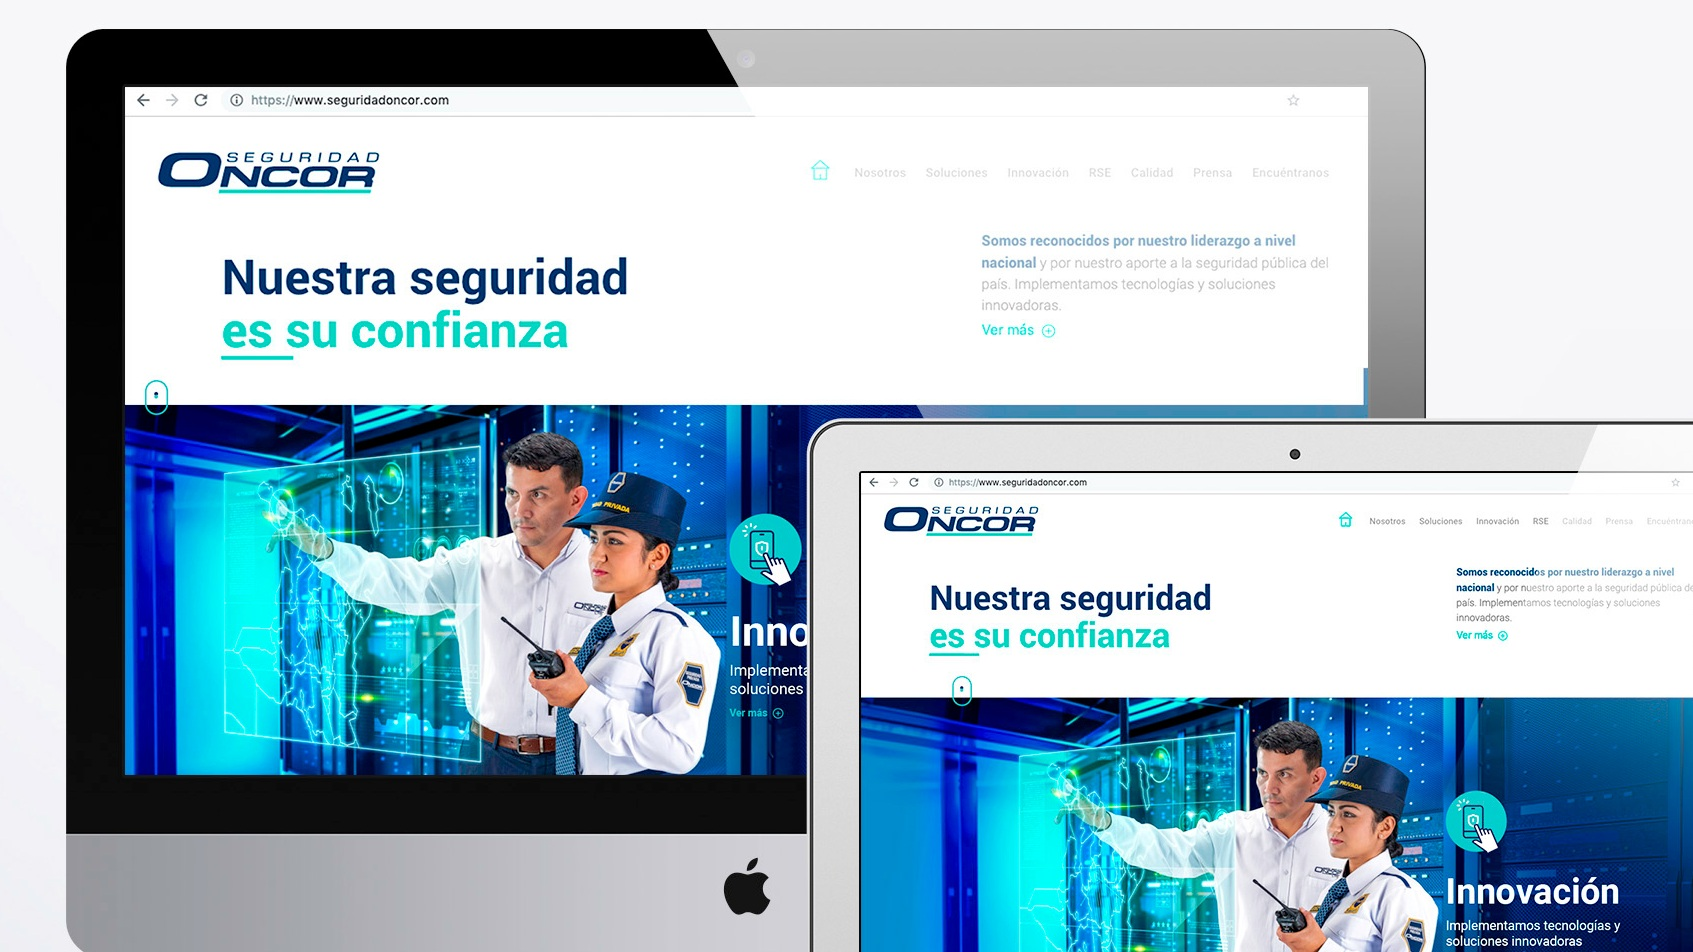 img_ekon7_seguridad_oncor_responsive4.jpg